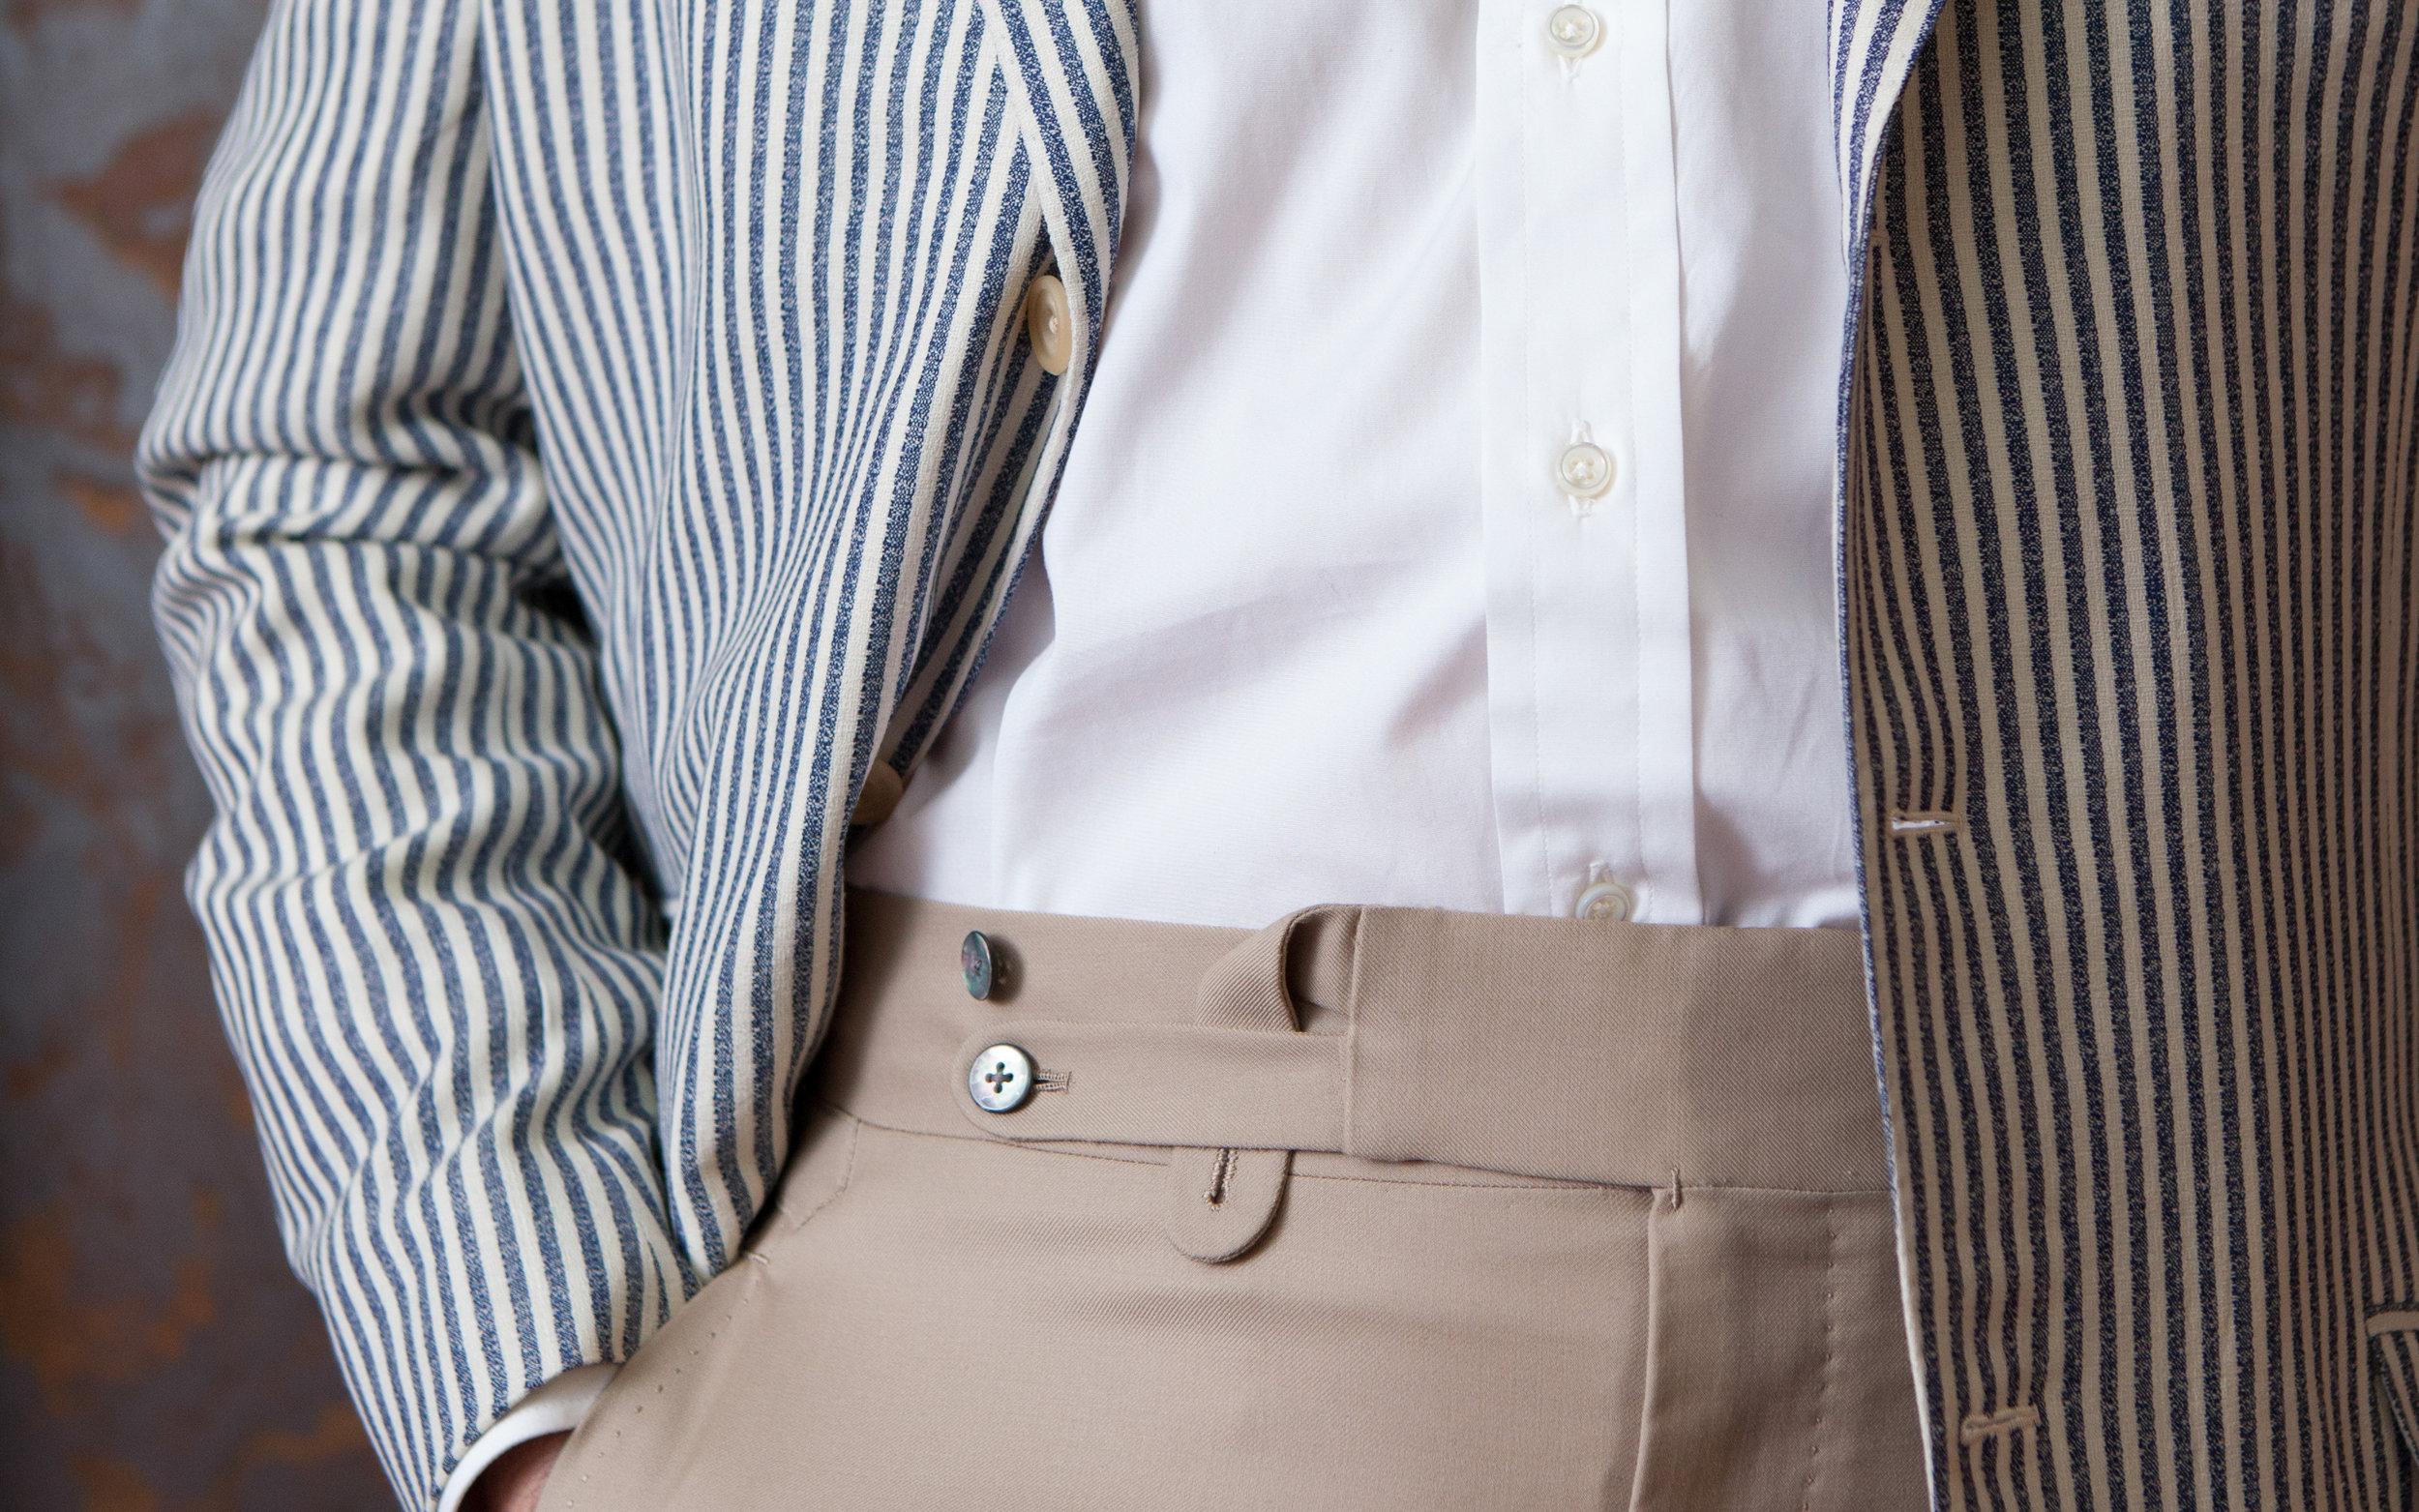 Trousers Waistband.jpg